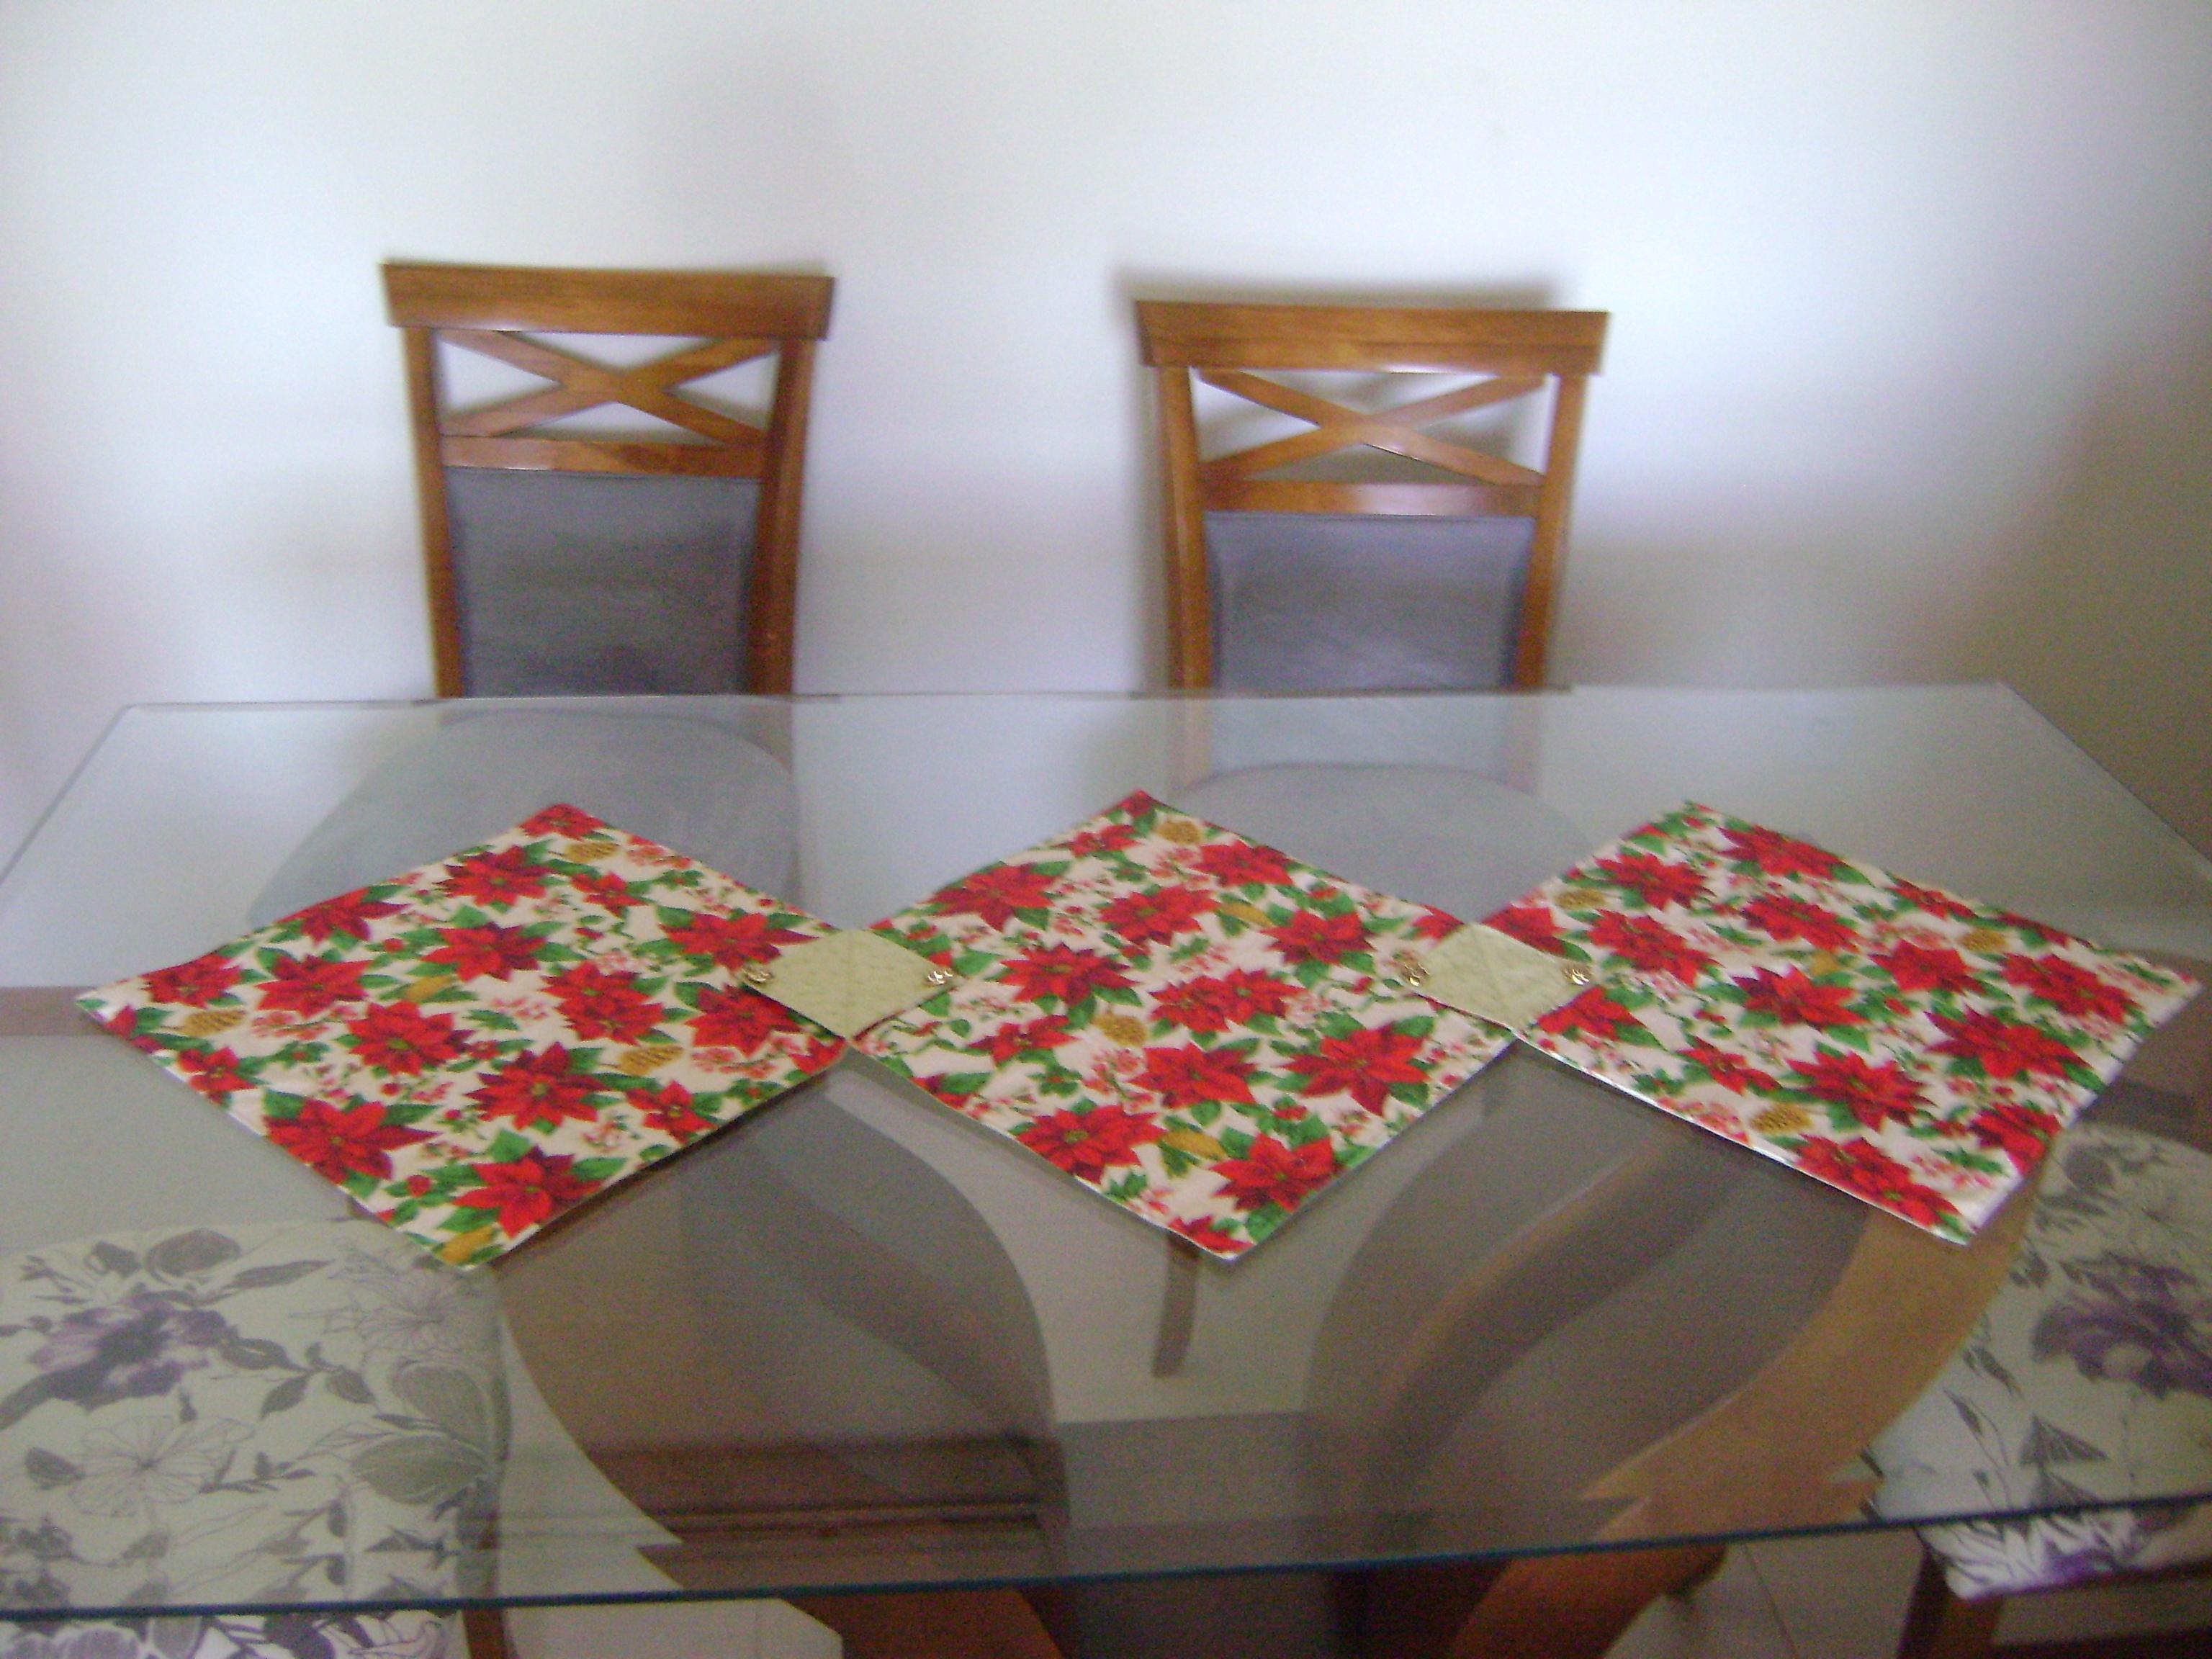 decoracao cozinha natal : decoracao cozinha natal:trilho de mesa natal cozinha decoracao trilho de mesa natal trilho de